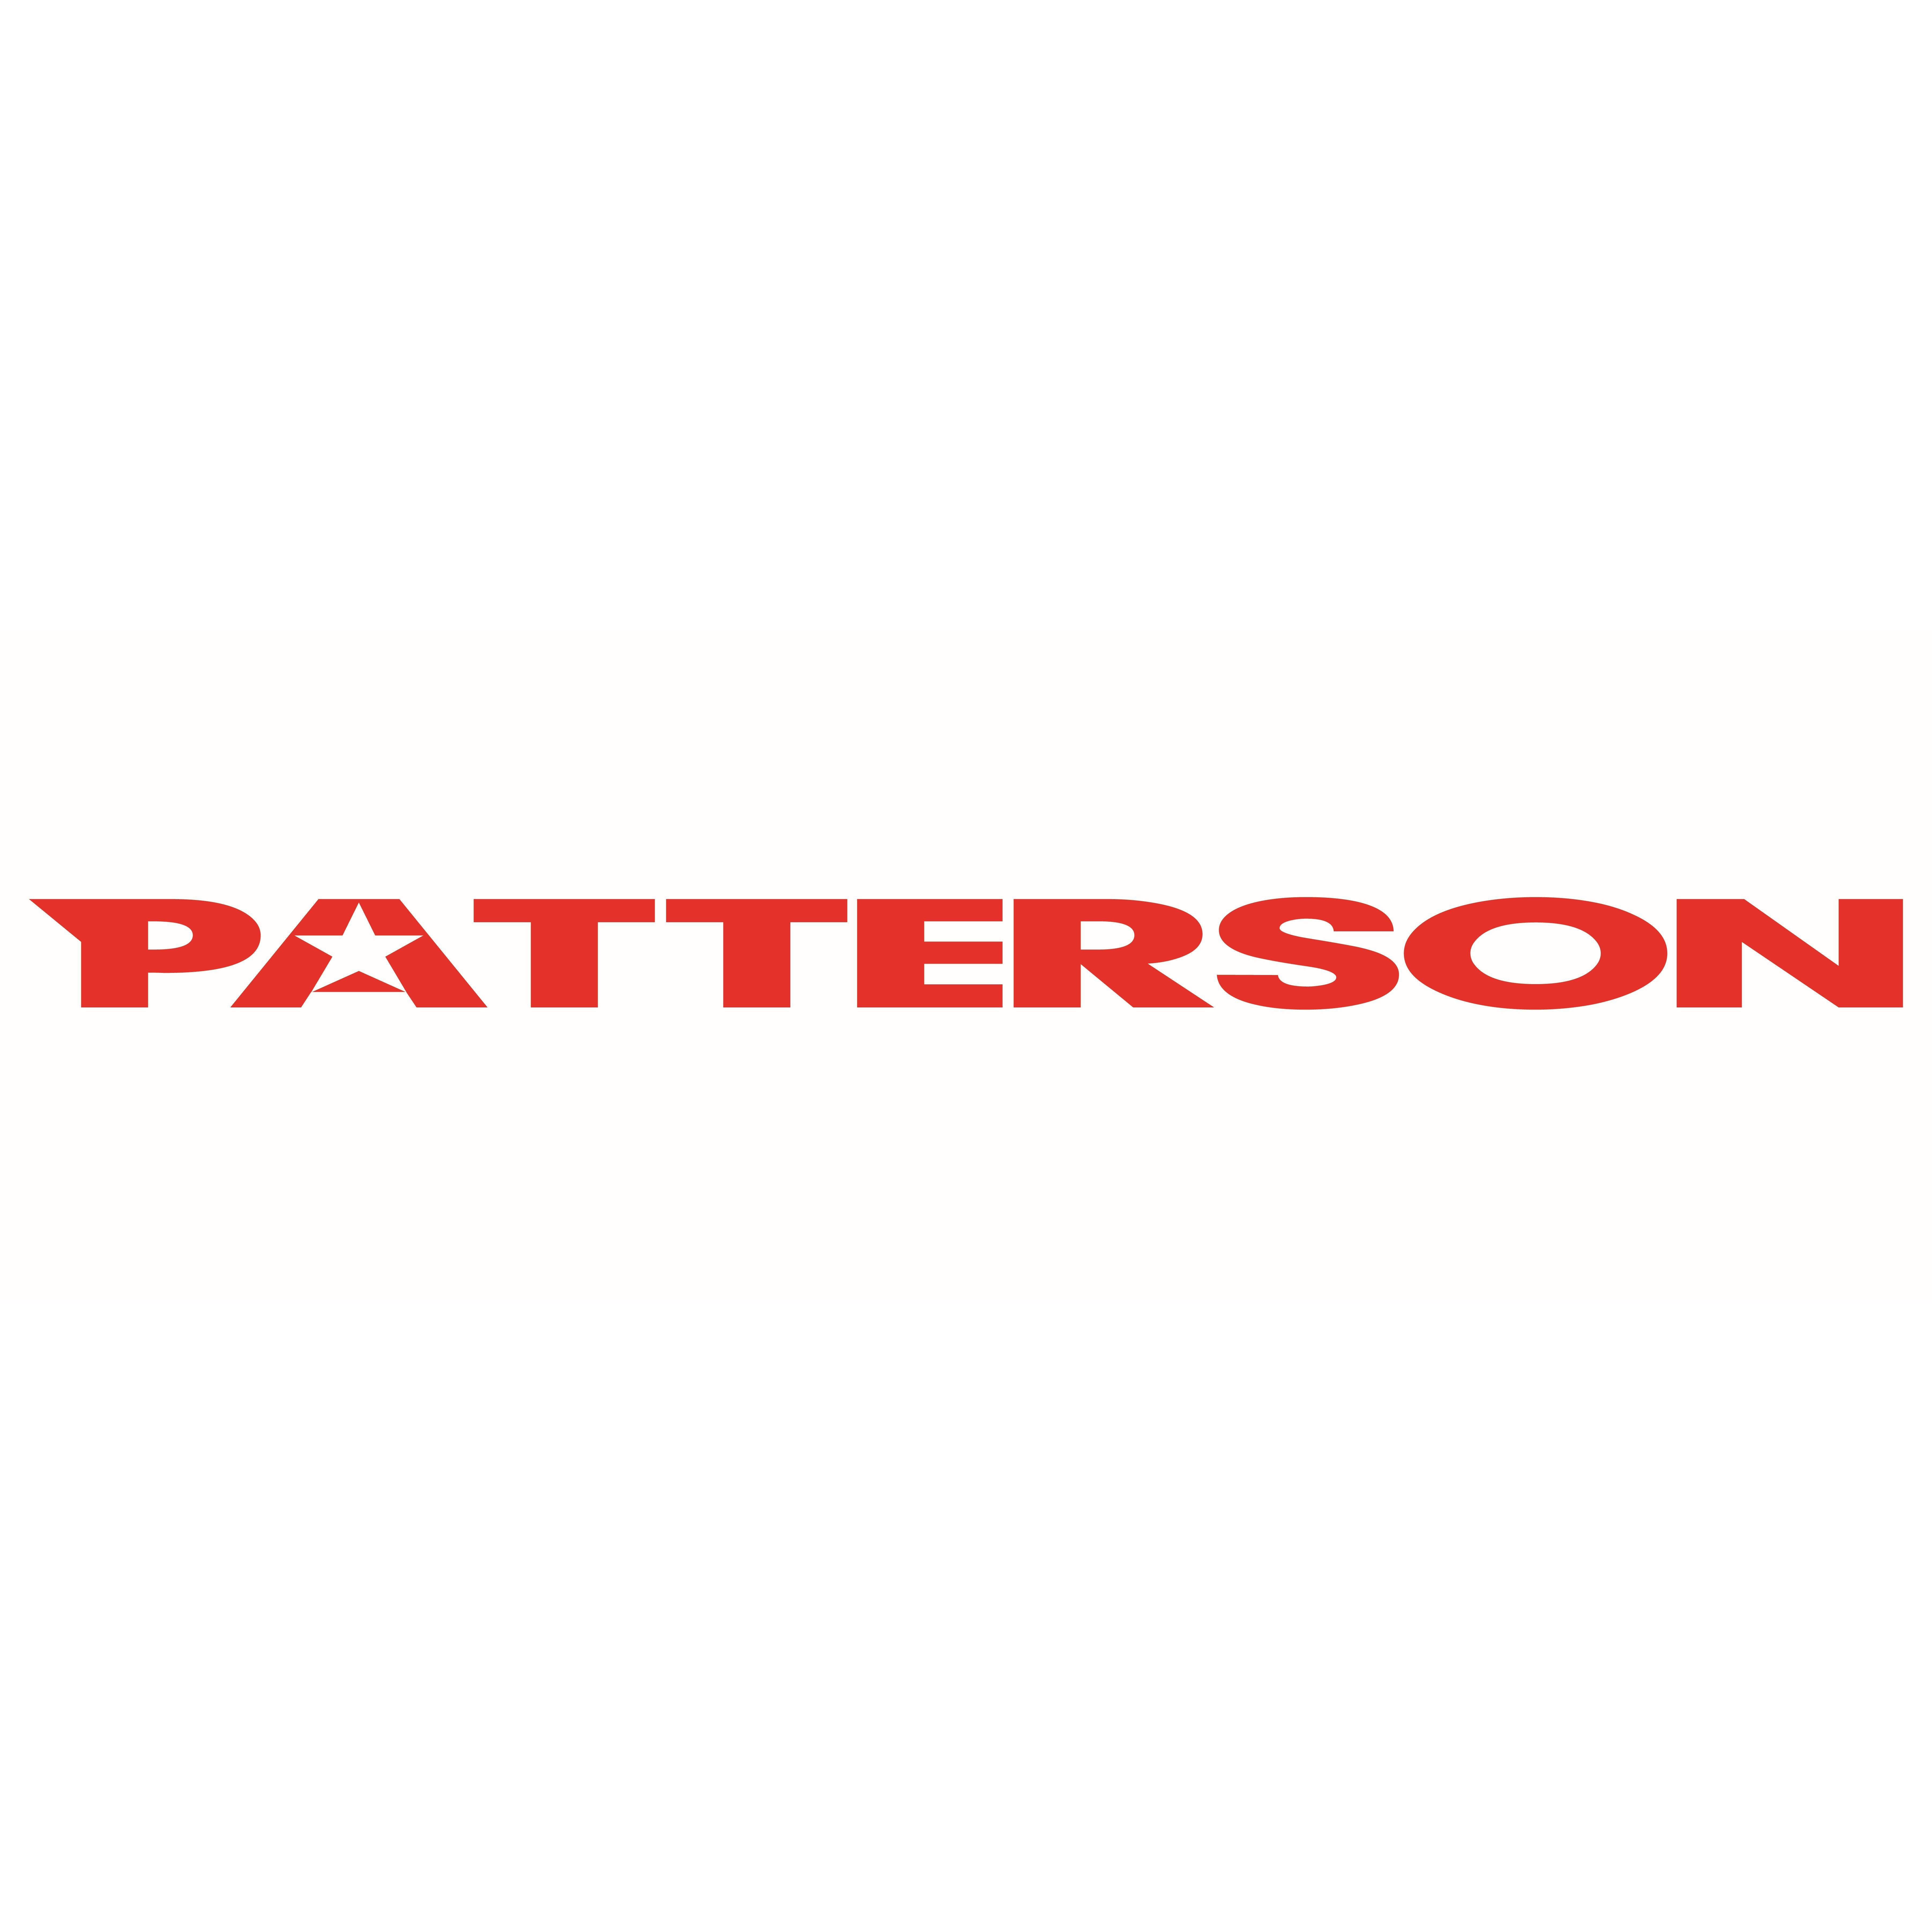 Patterson Chrysler Dodge Jeep Ram Tyler